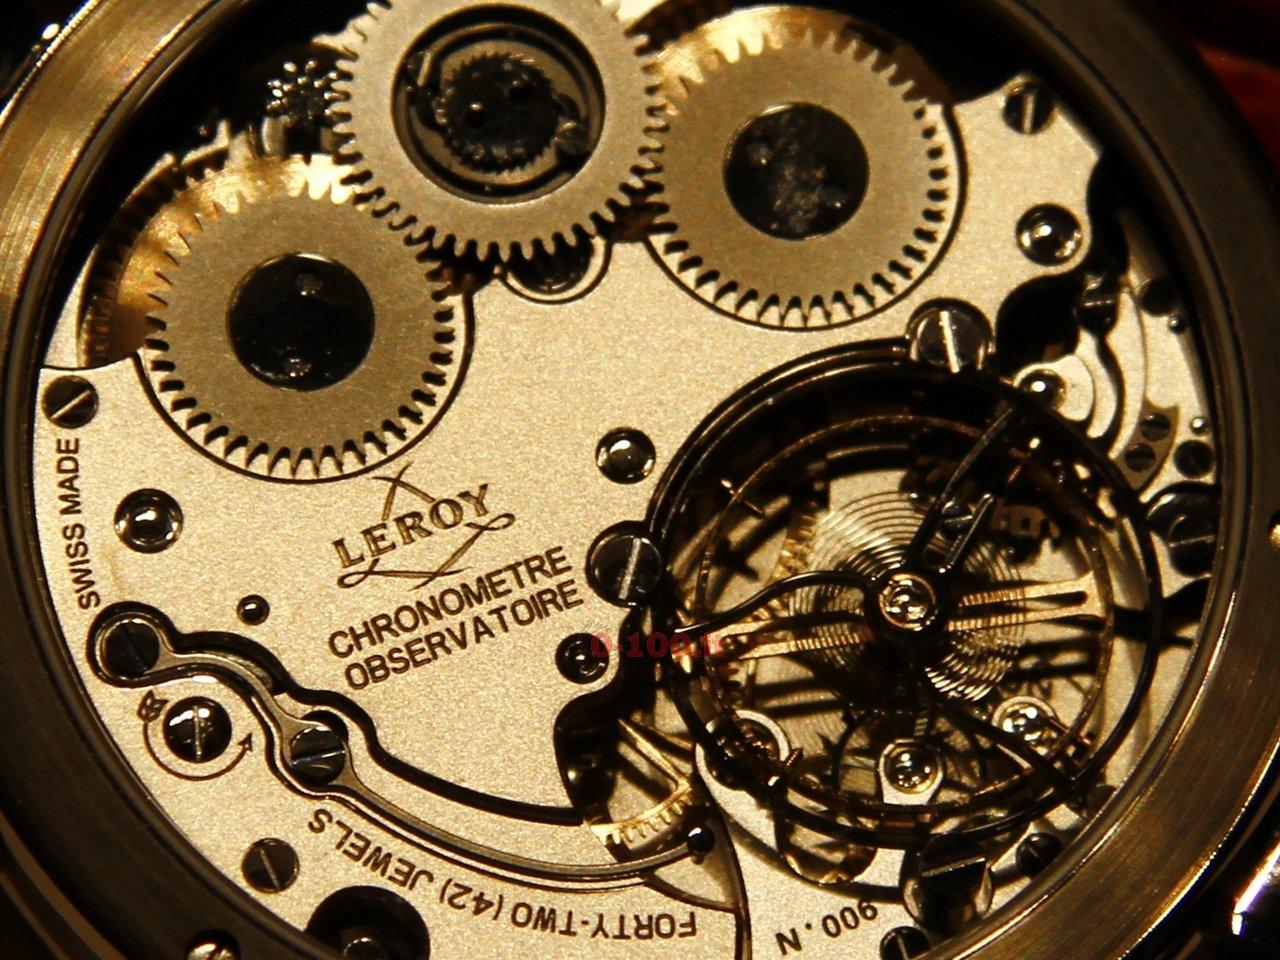 baselworld-2015_leroy-chronometer-l200-0-100-15